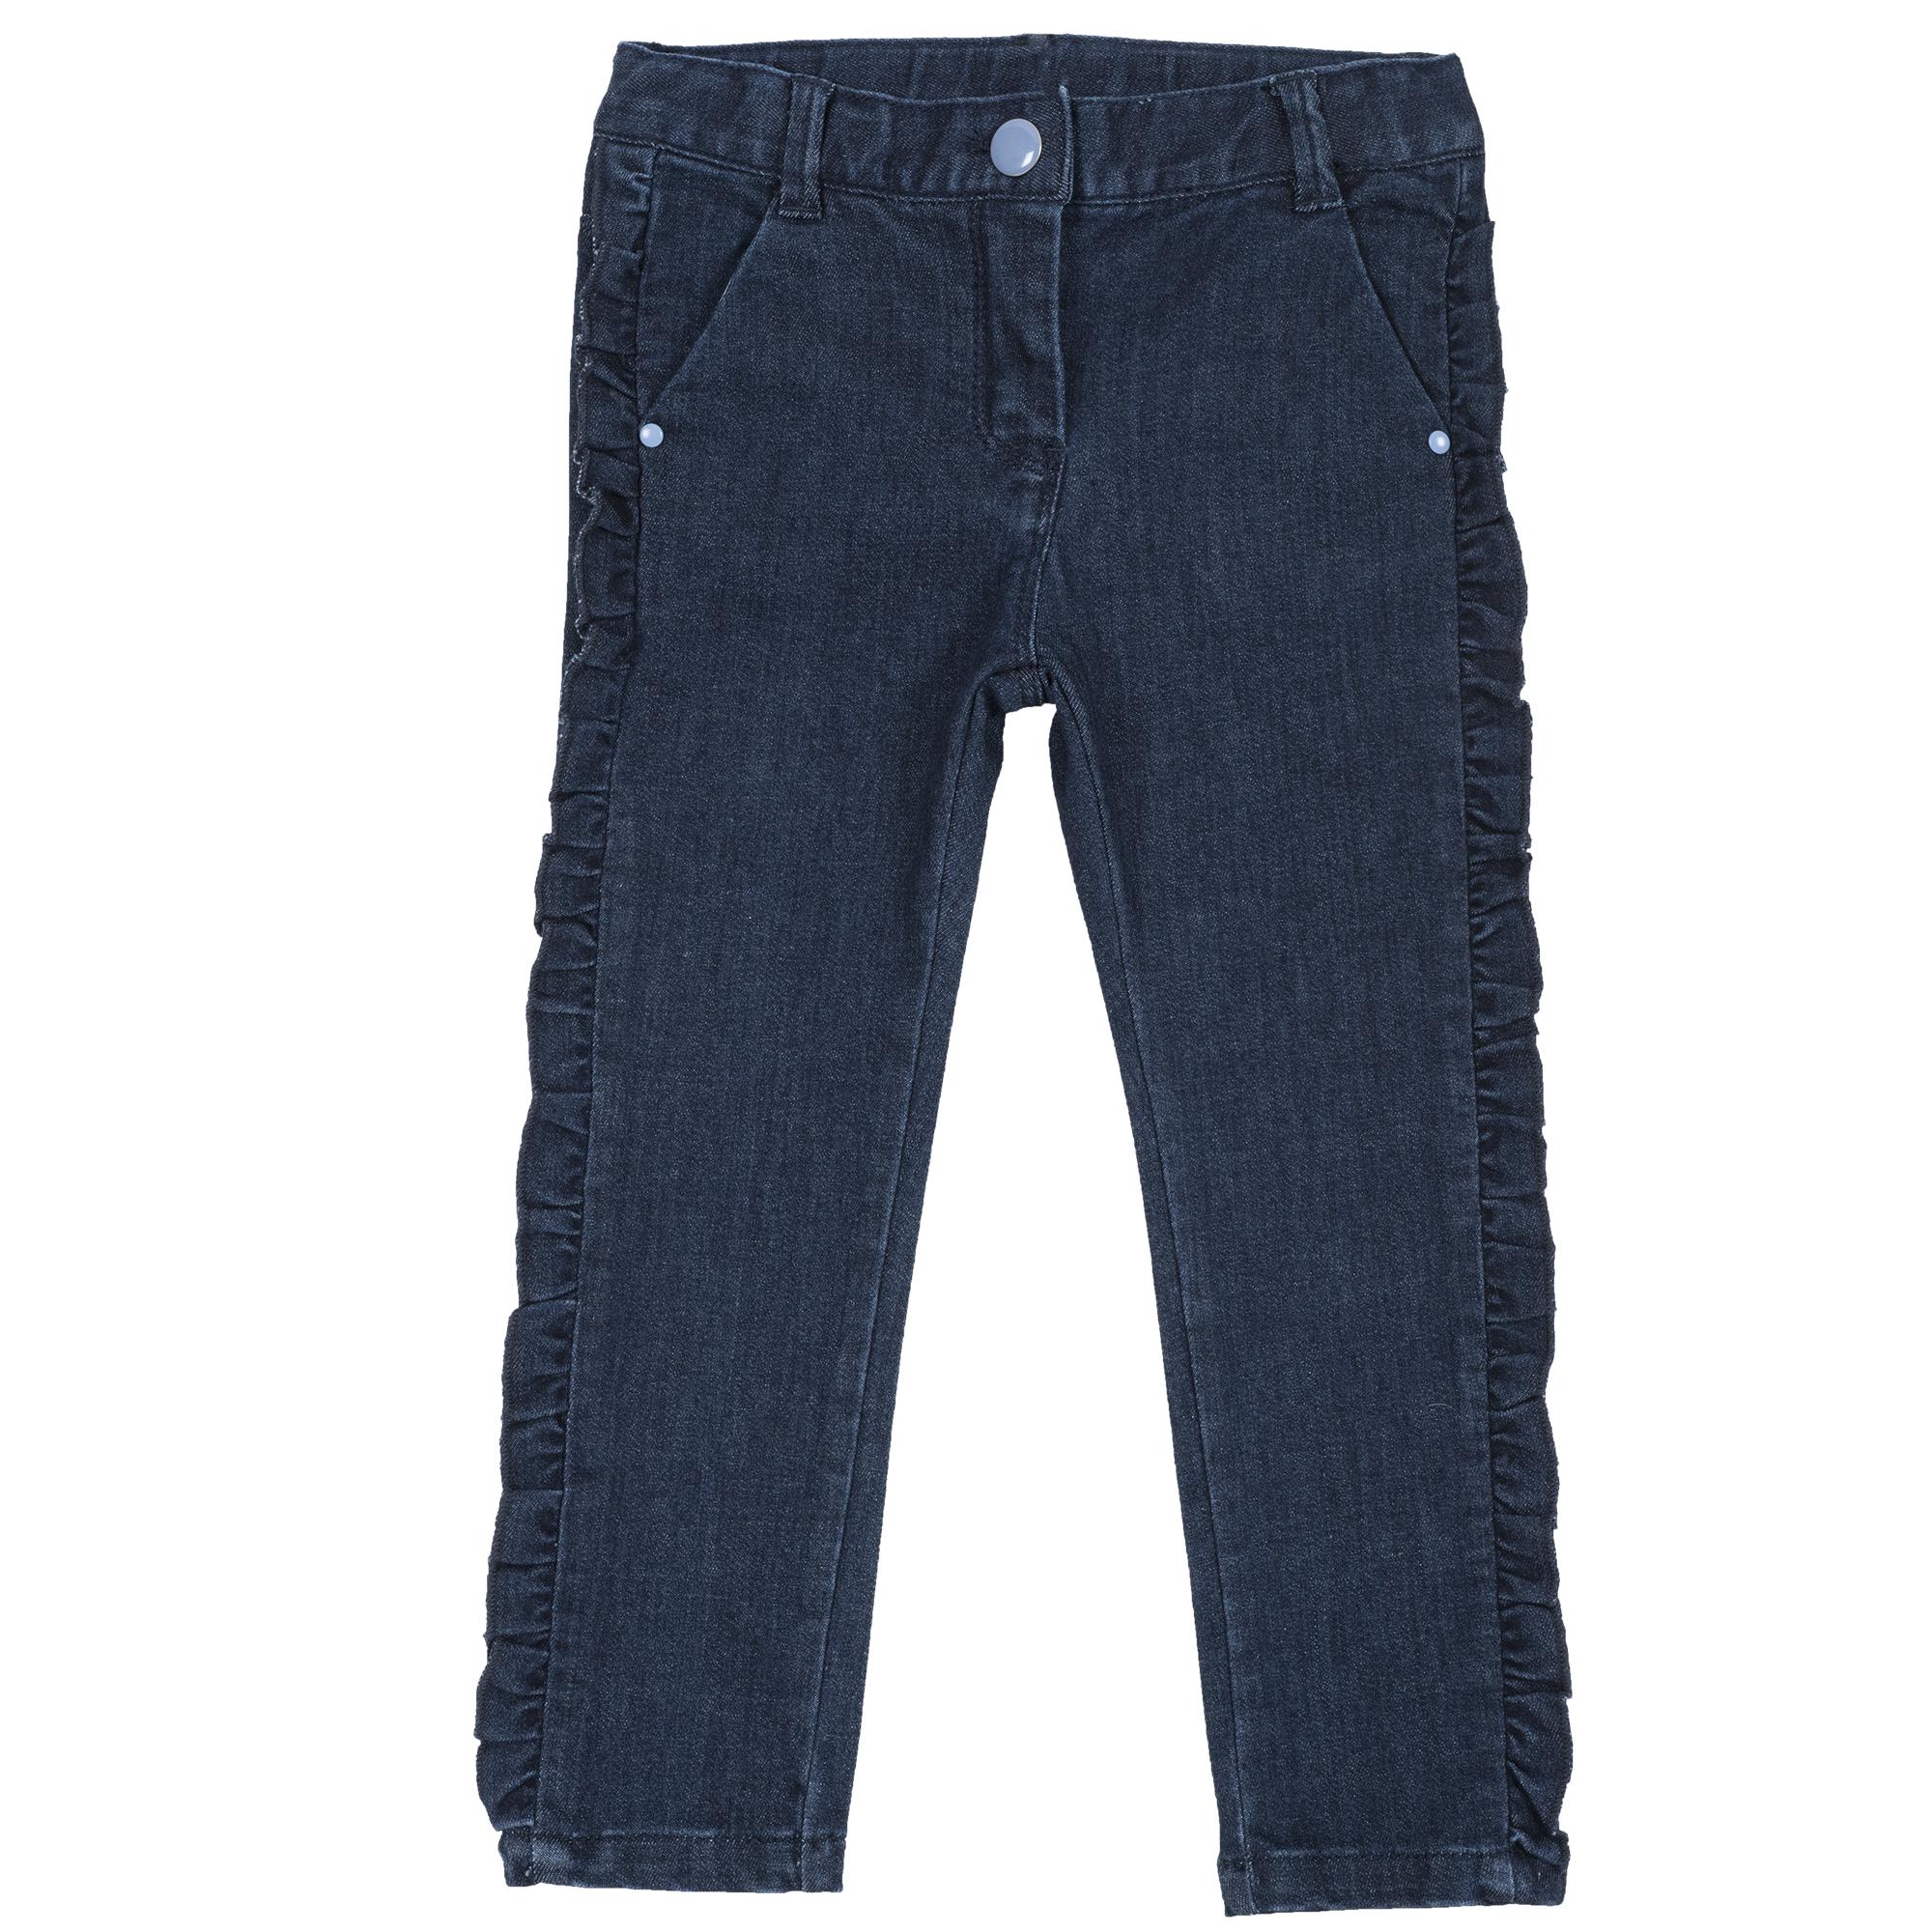 Pantalon copii Chicco, albastru inchis